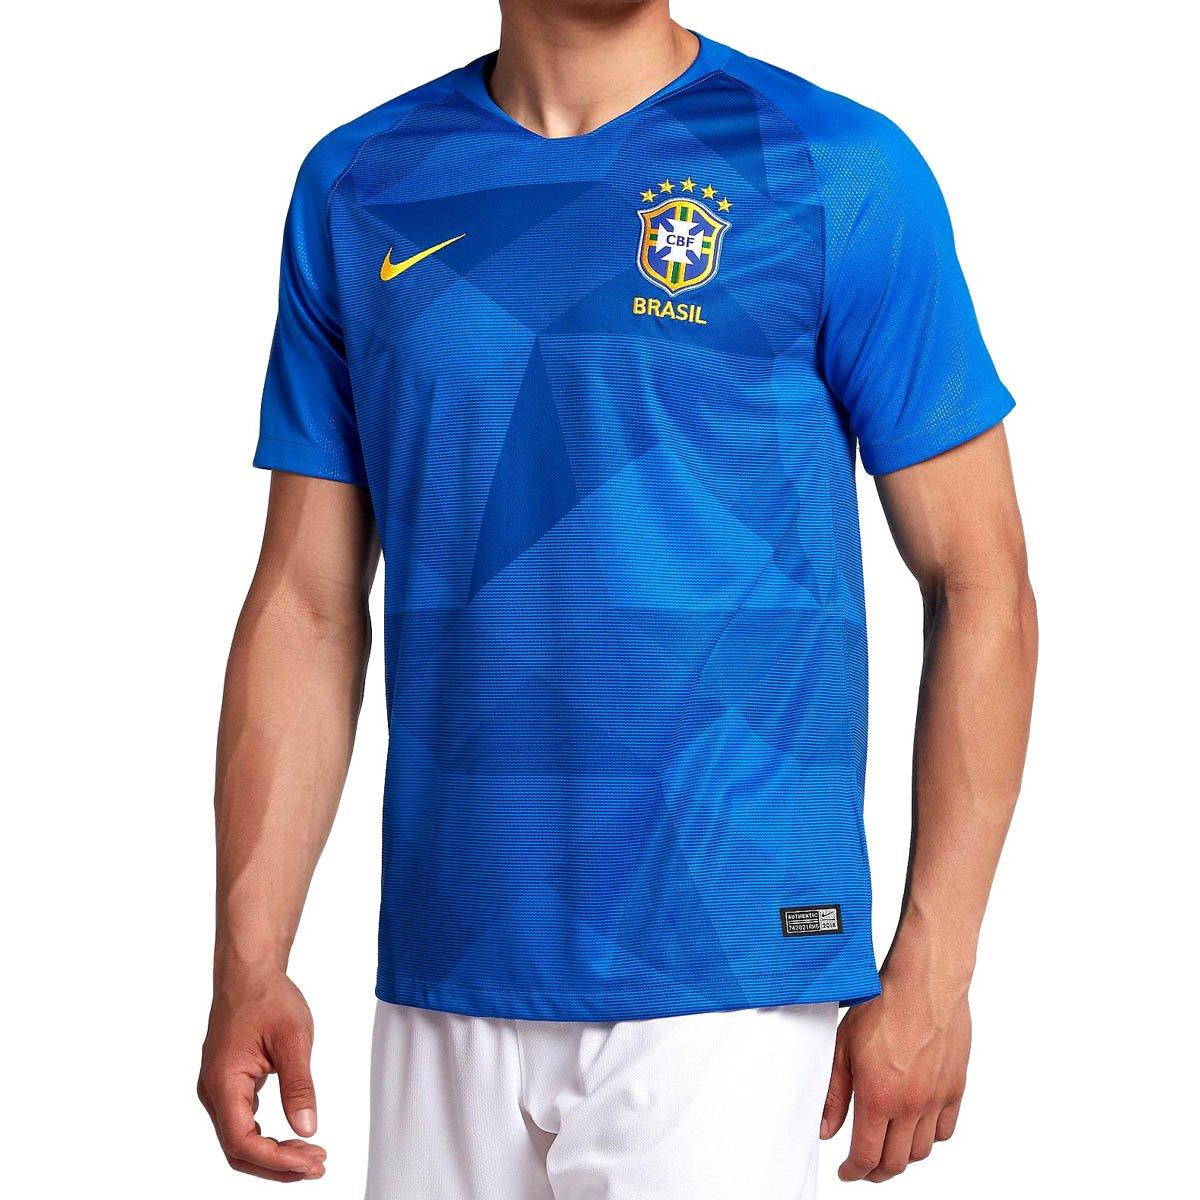 Huérfano Condicional manual  Camisa Masculina Nike Brasil II 2019/20 Torcedor 893855-453 - Azul - Botas  Online Femininas, Masculinas e Infantis   Mundodasbotas.com.br